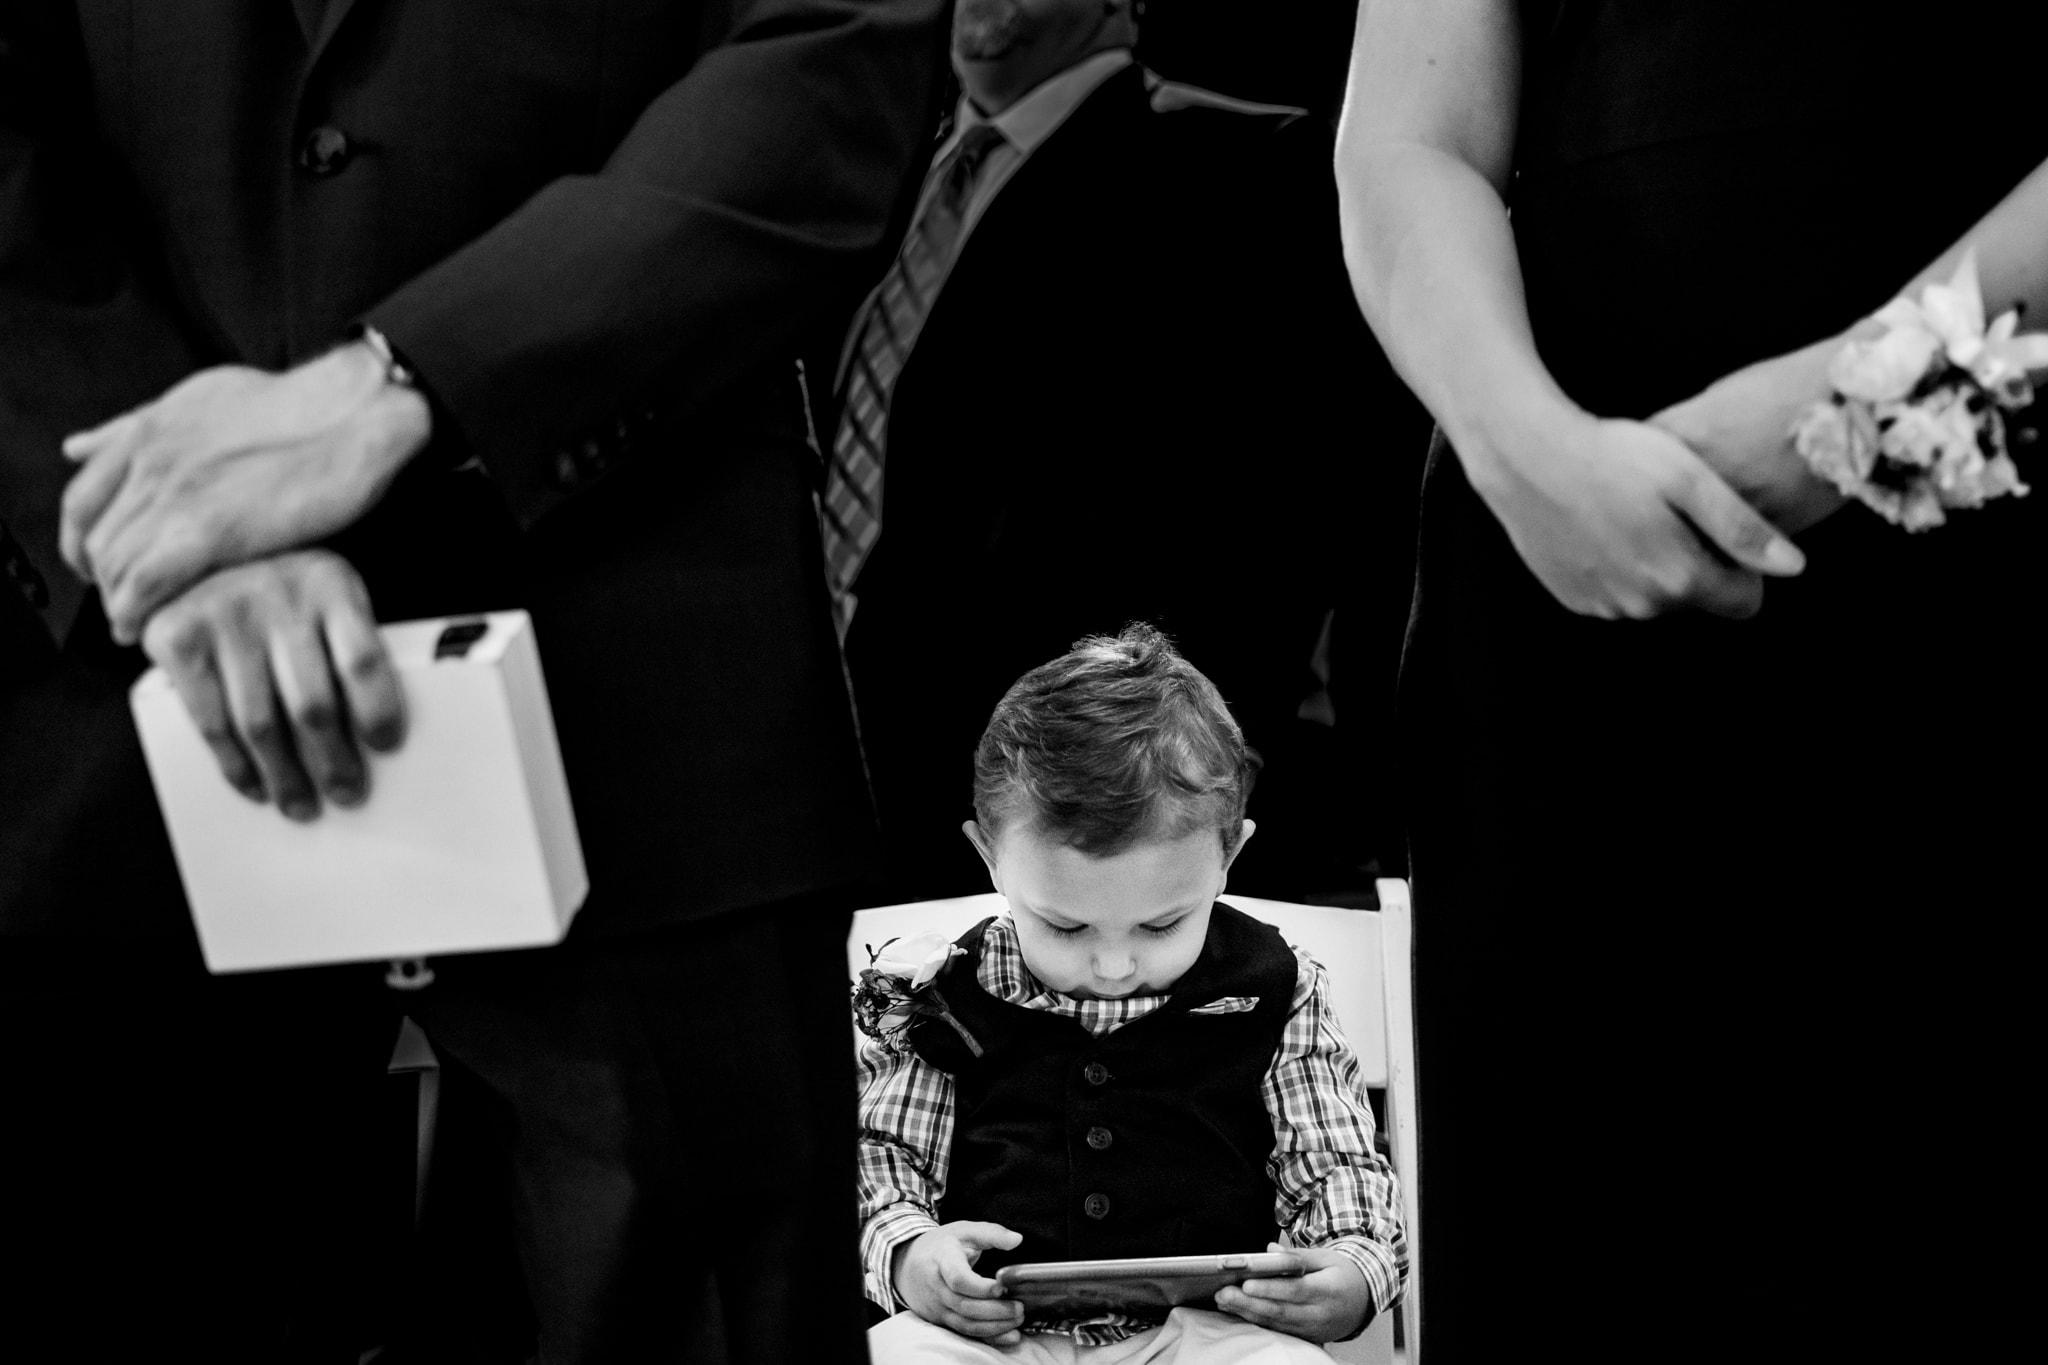 Cute Photos of Kids at Weddings